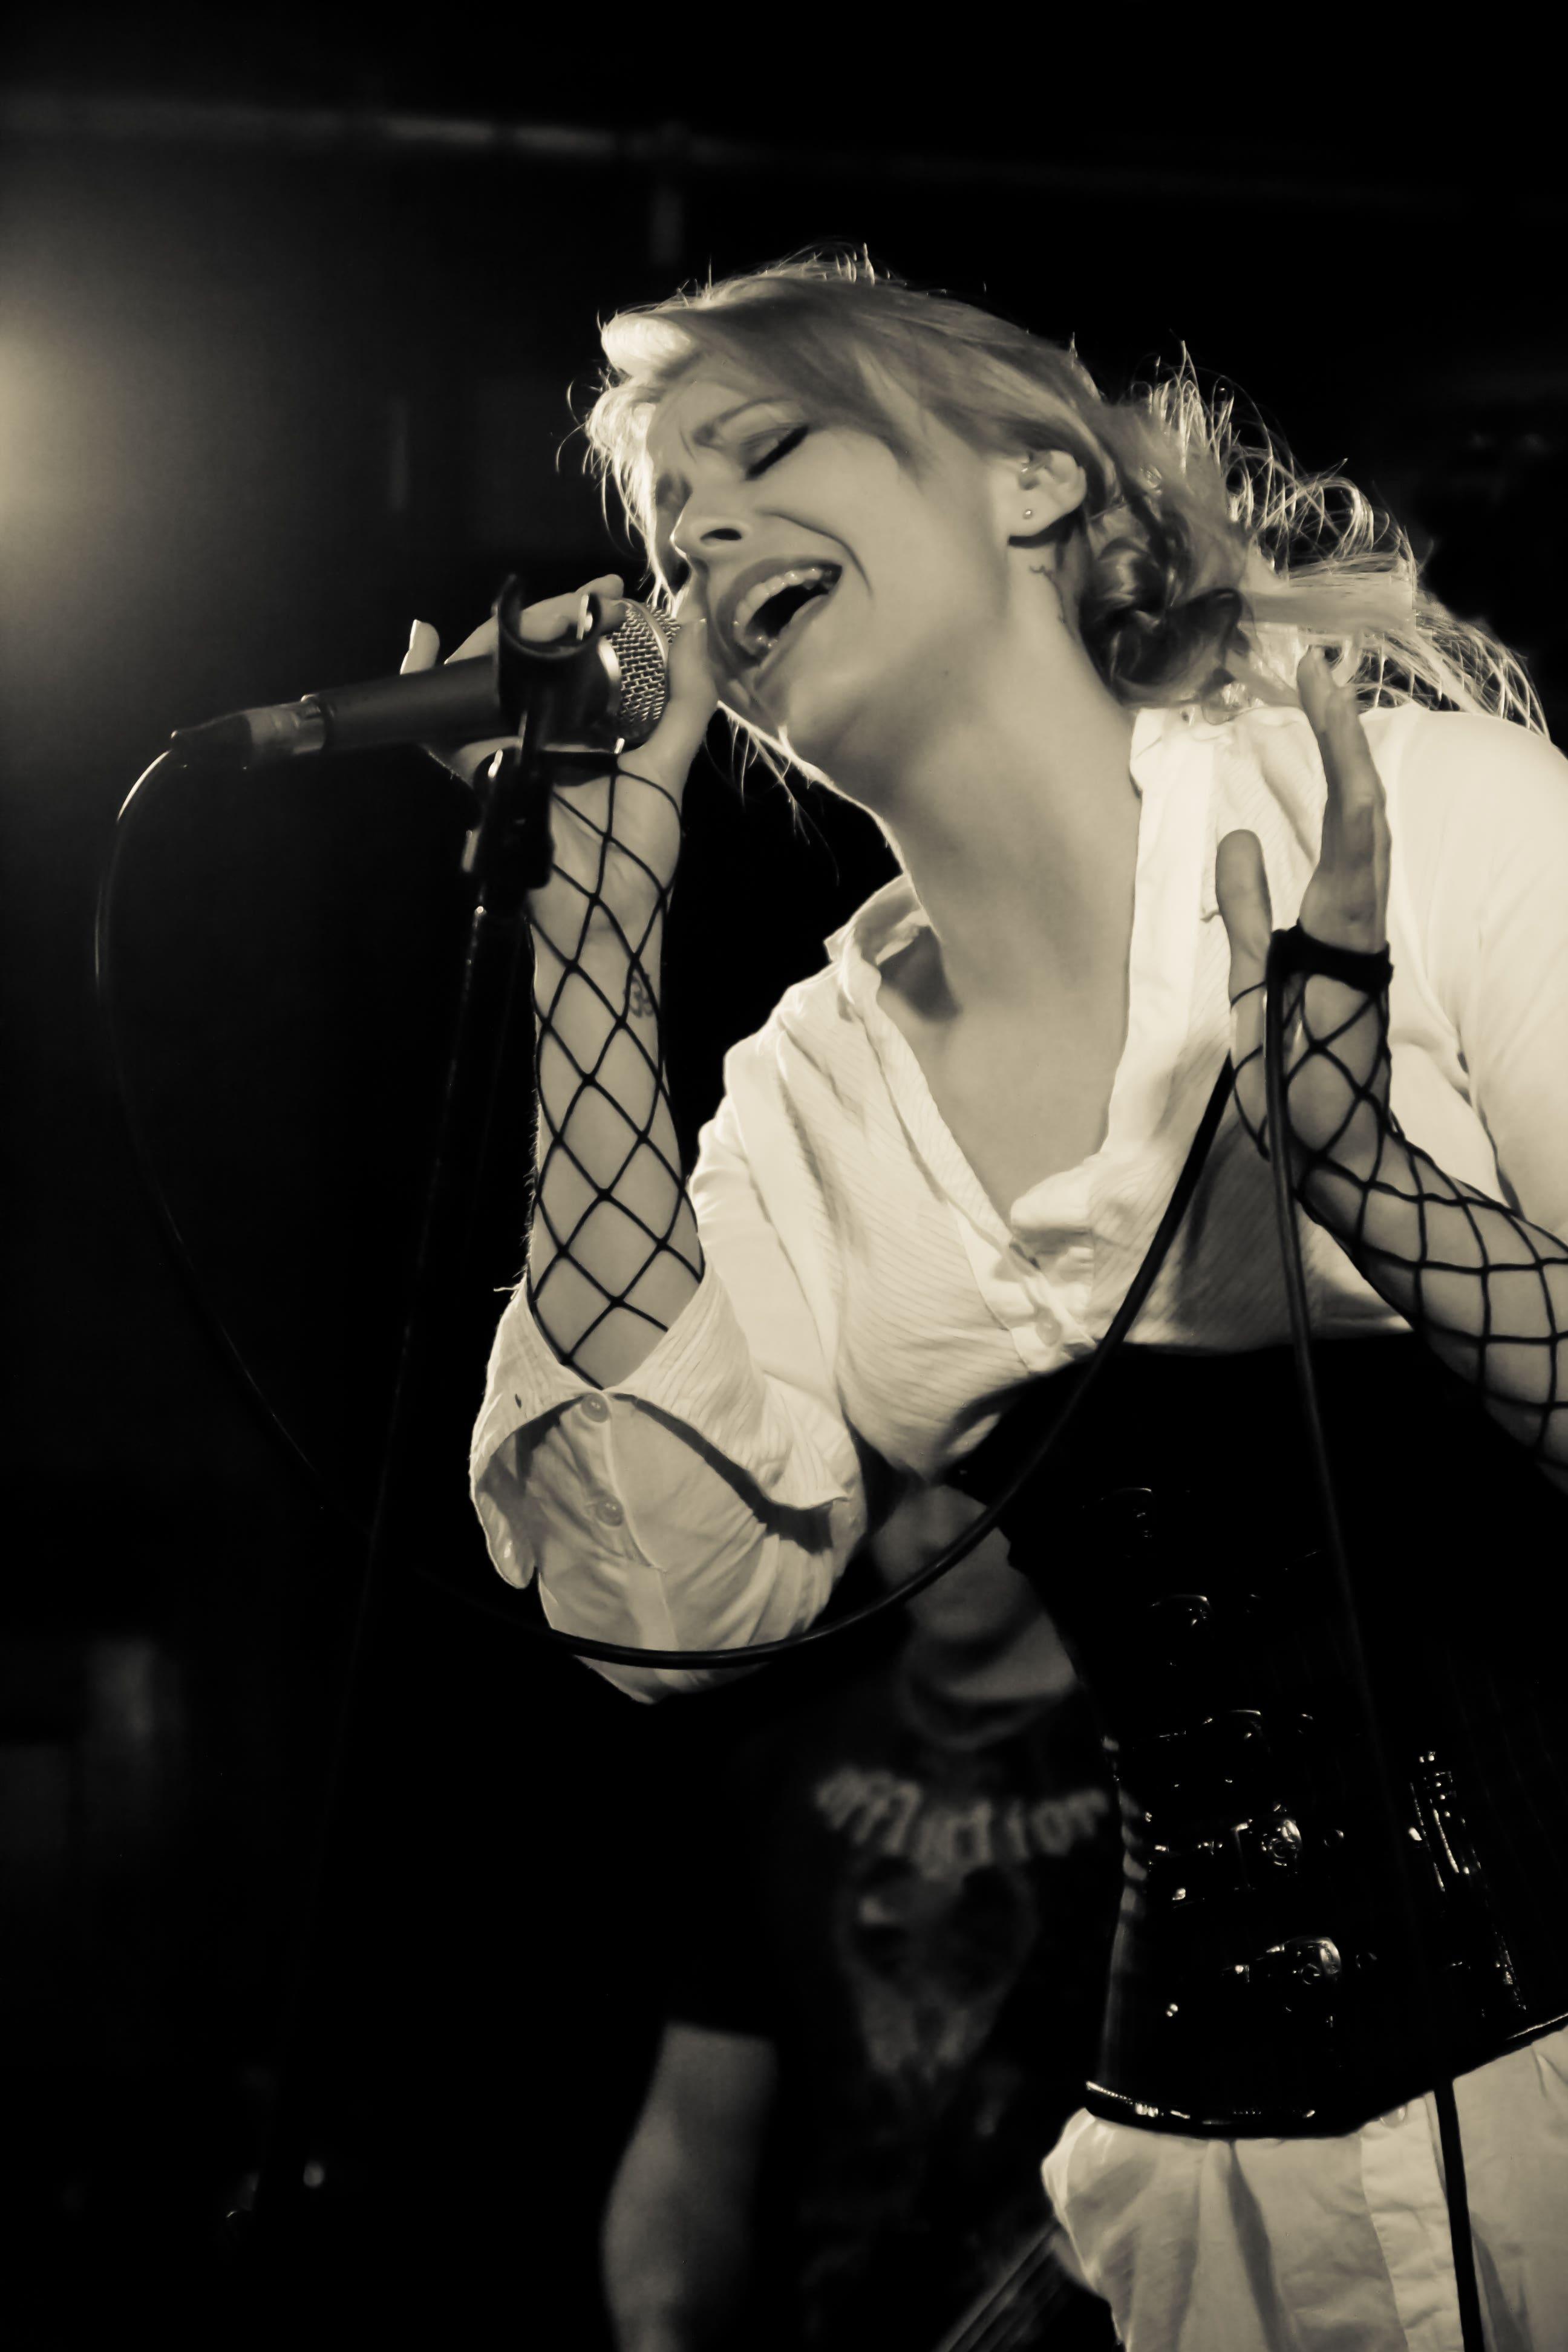 Singer during show